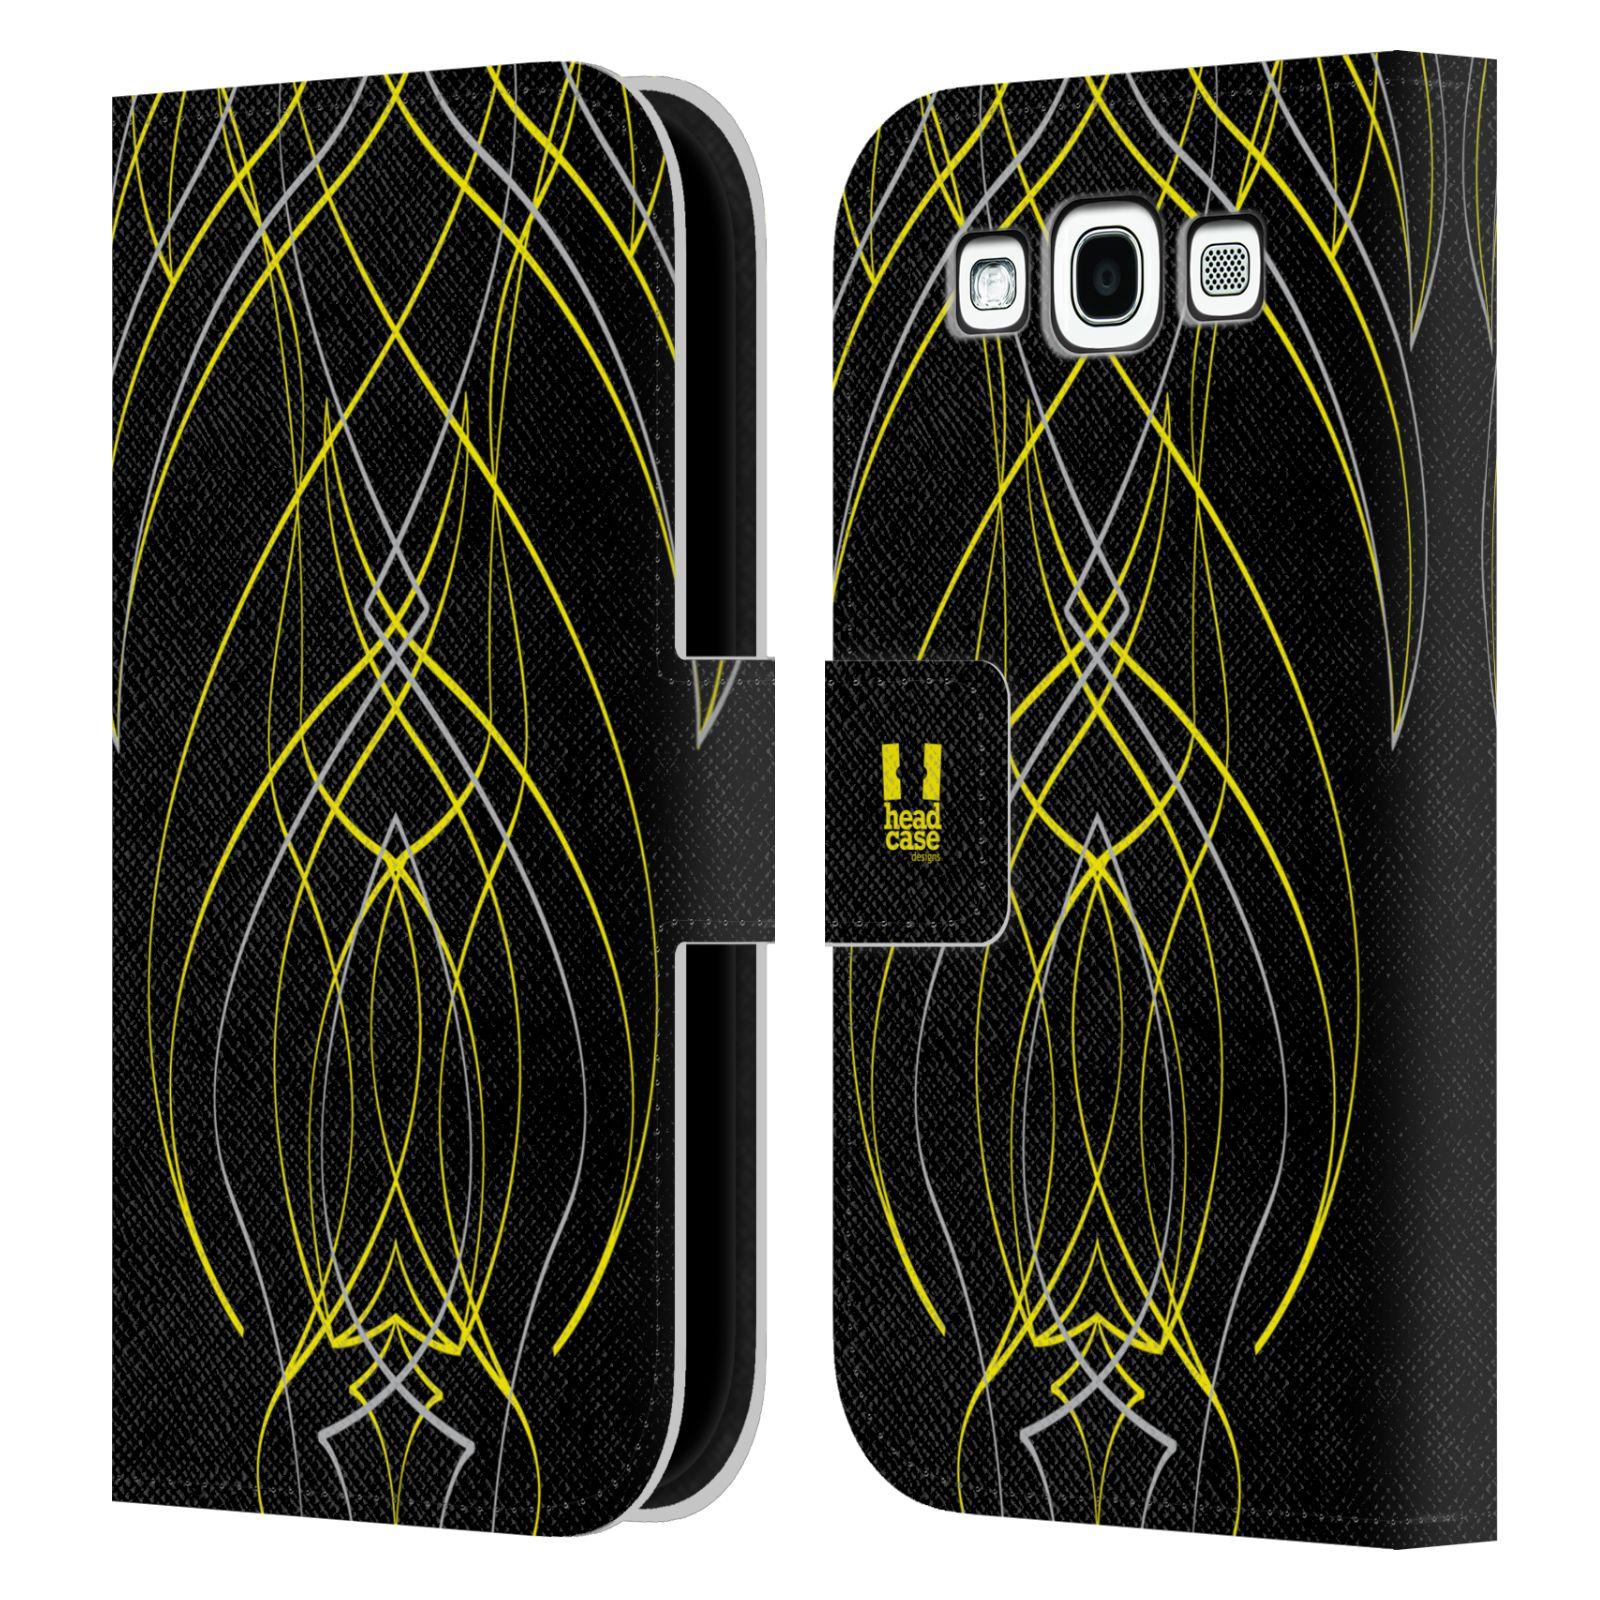 HEAD CASE Flipové pouzdro pro mobil Samsung Galaxy S3 barevné proužky tvary žlutá